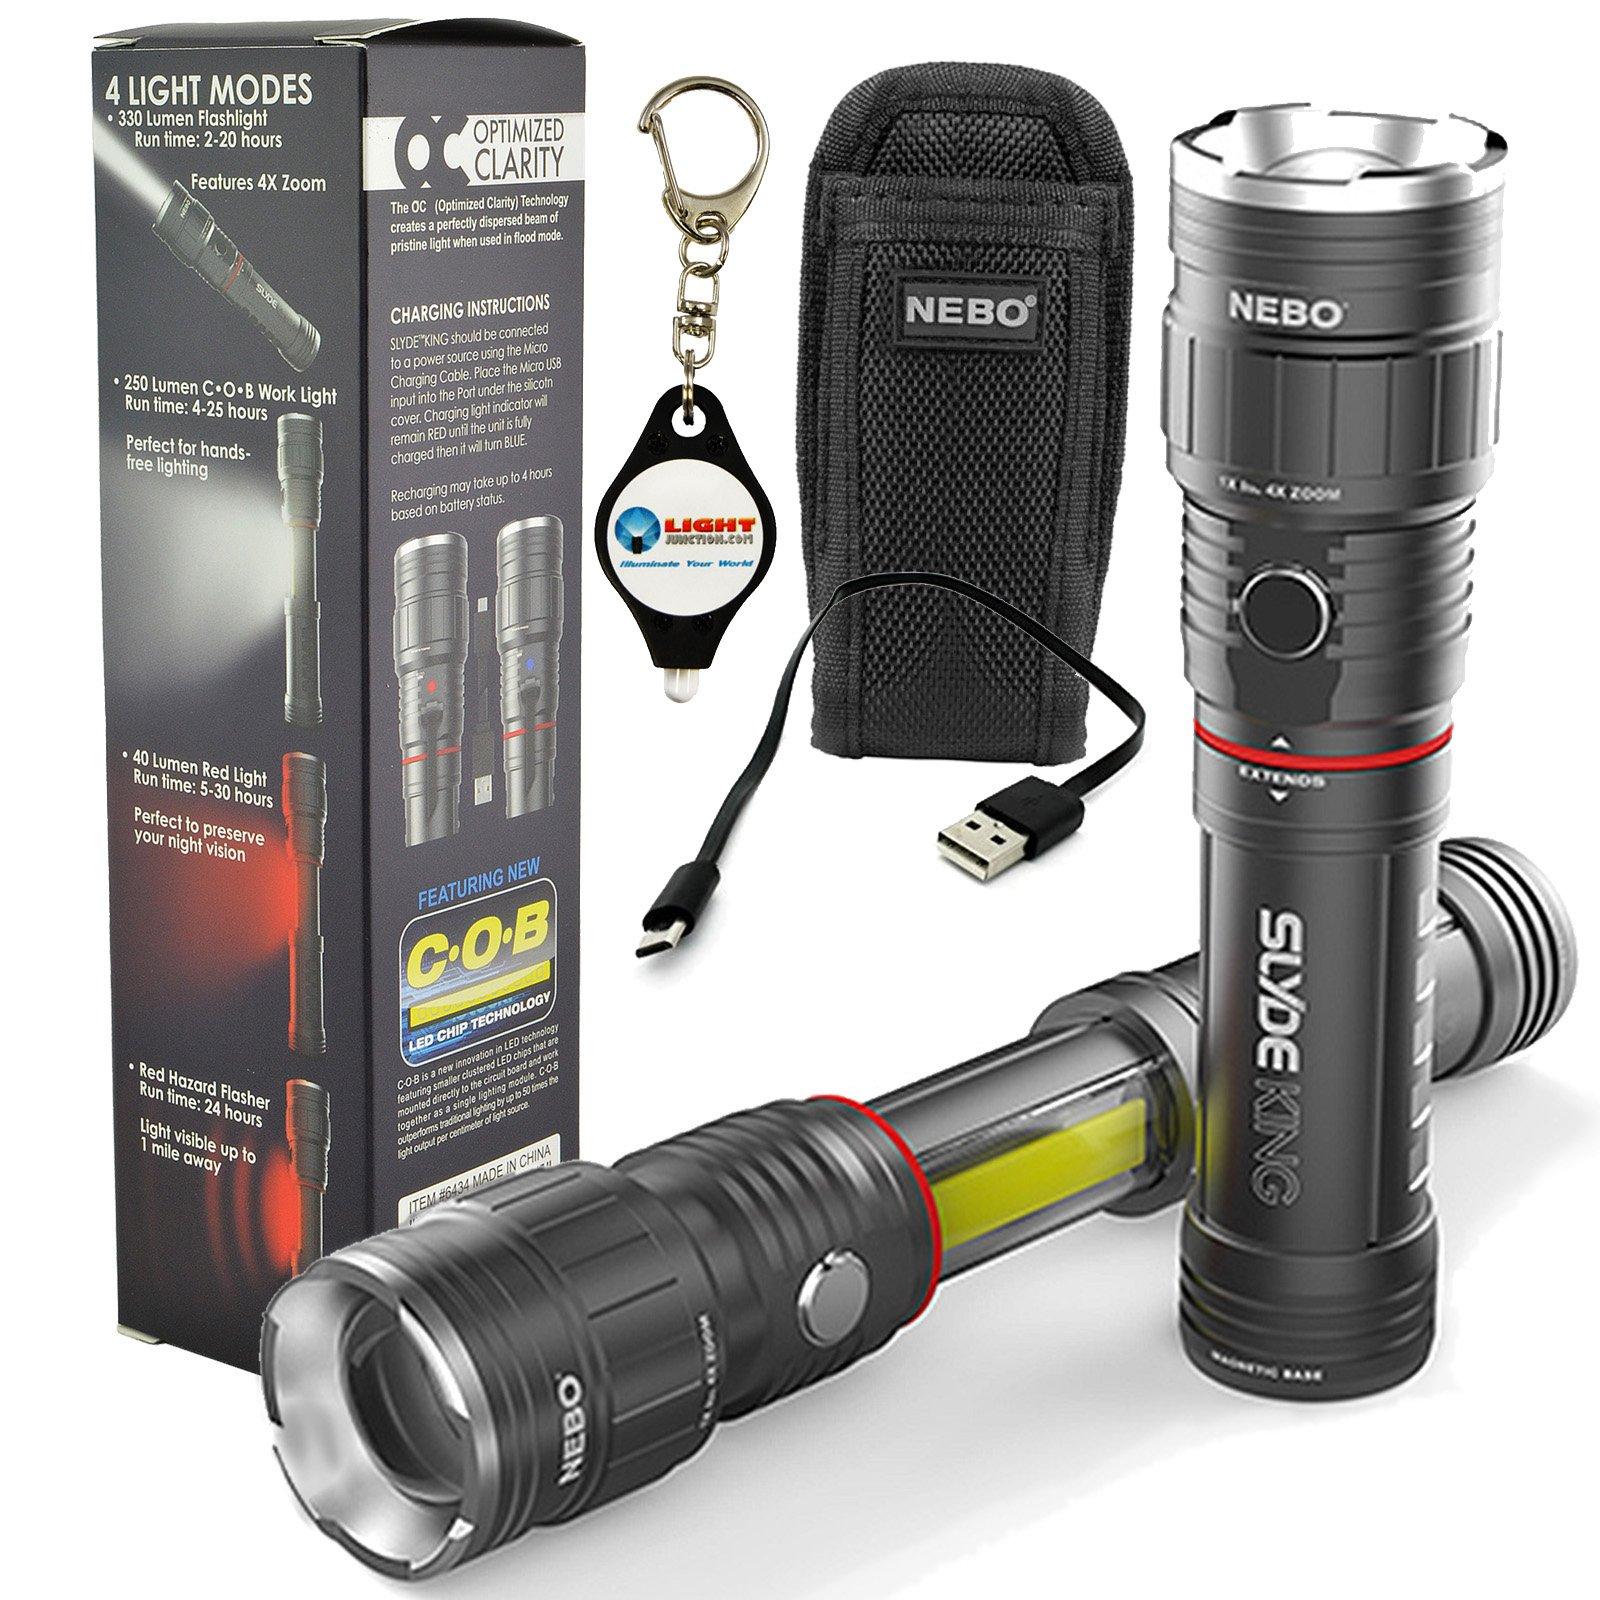 Nebo Slyde King 6434 Rechargeable LED Flashlight Work Light Adjustable Zoom with 6274 Holster and LightJunction Keychain Light